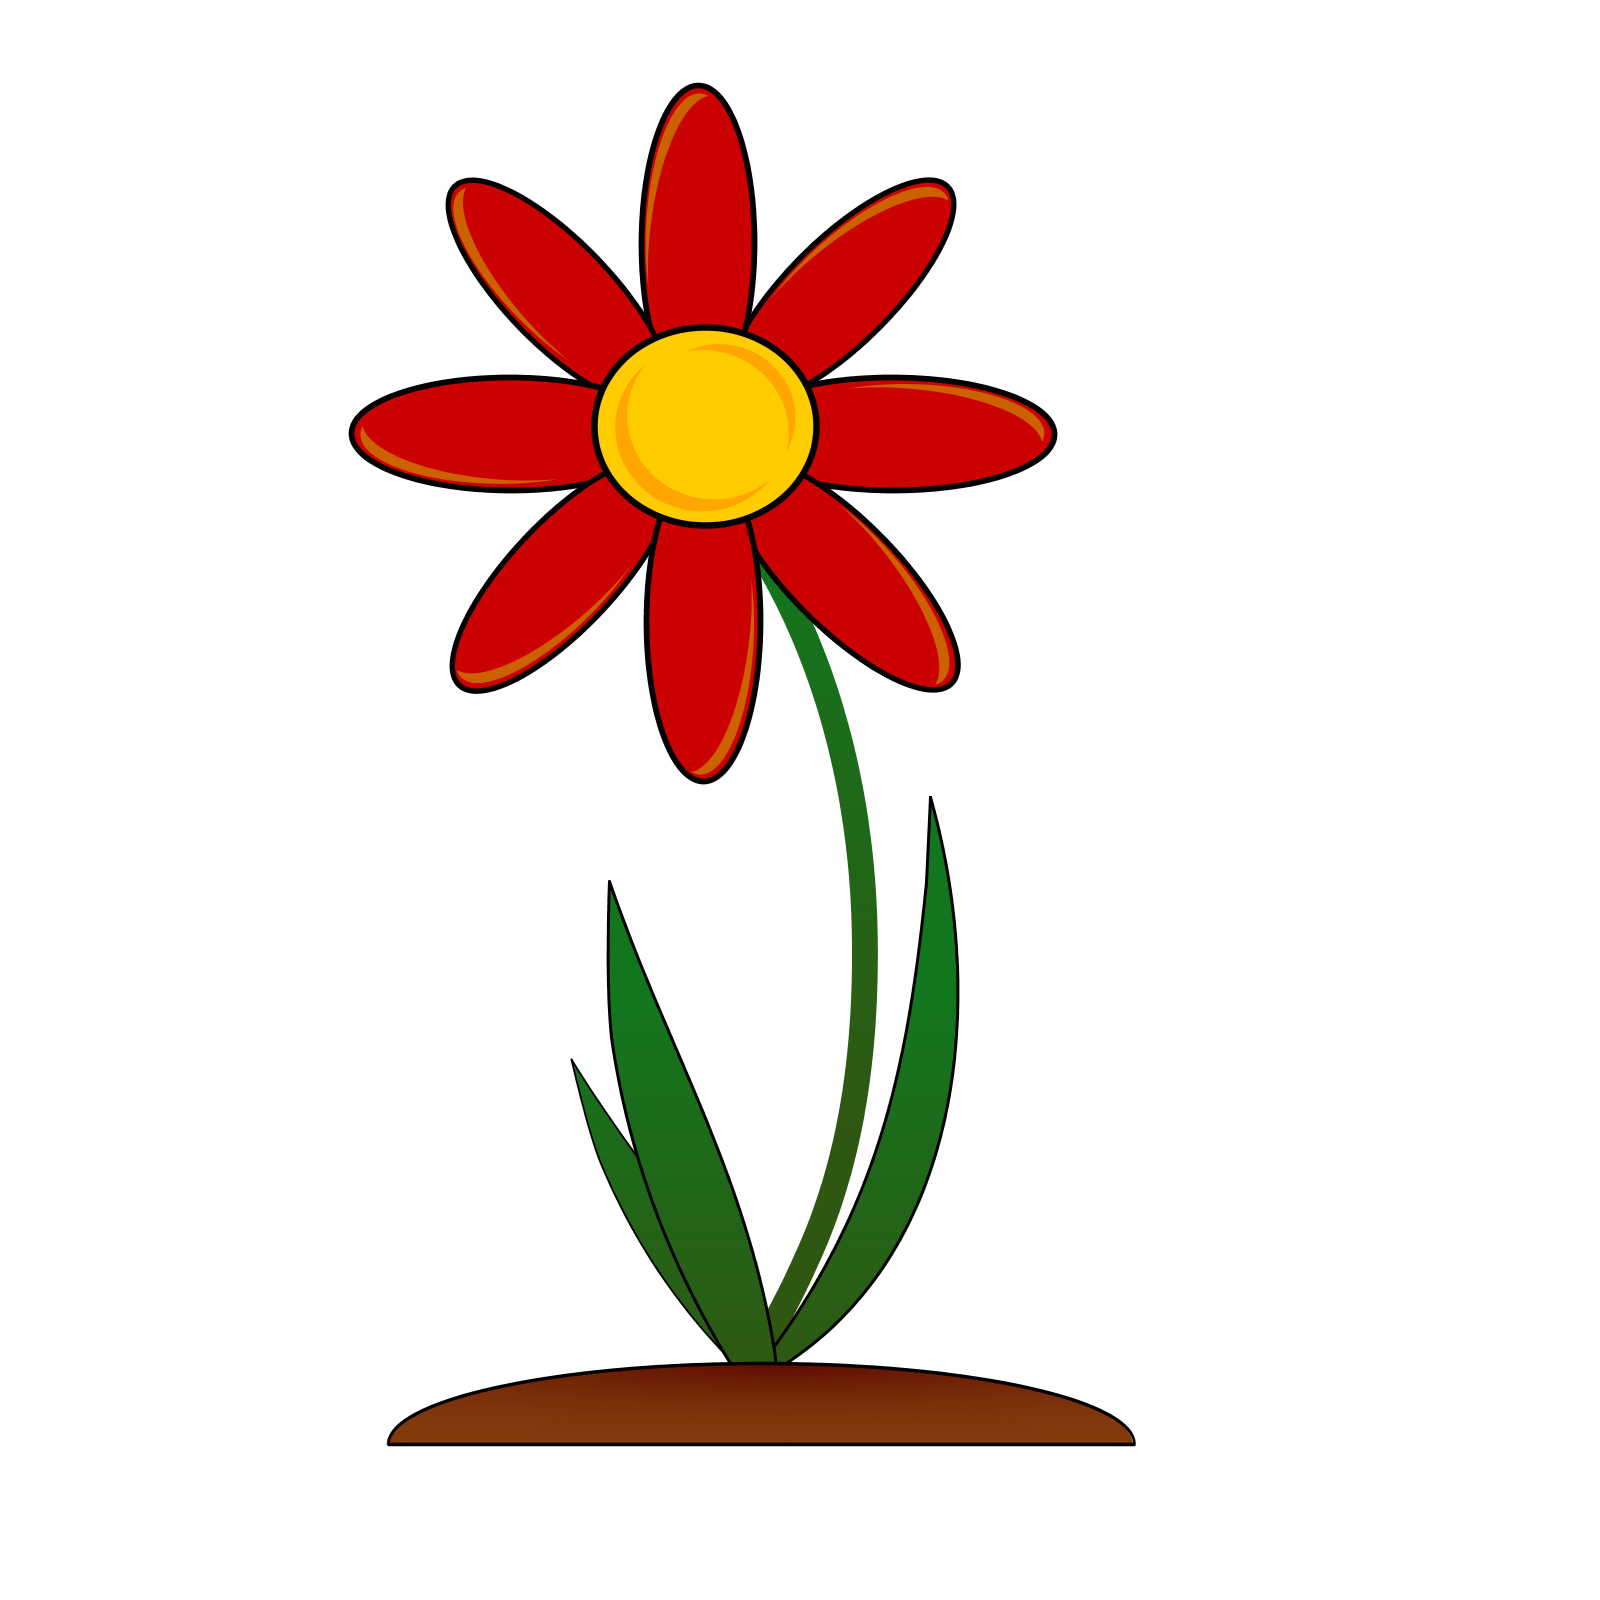 Flower clip art structure. Flowers clipart name